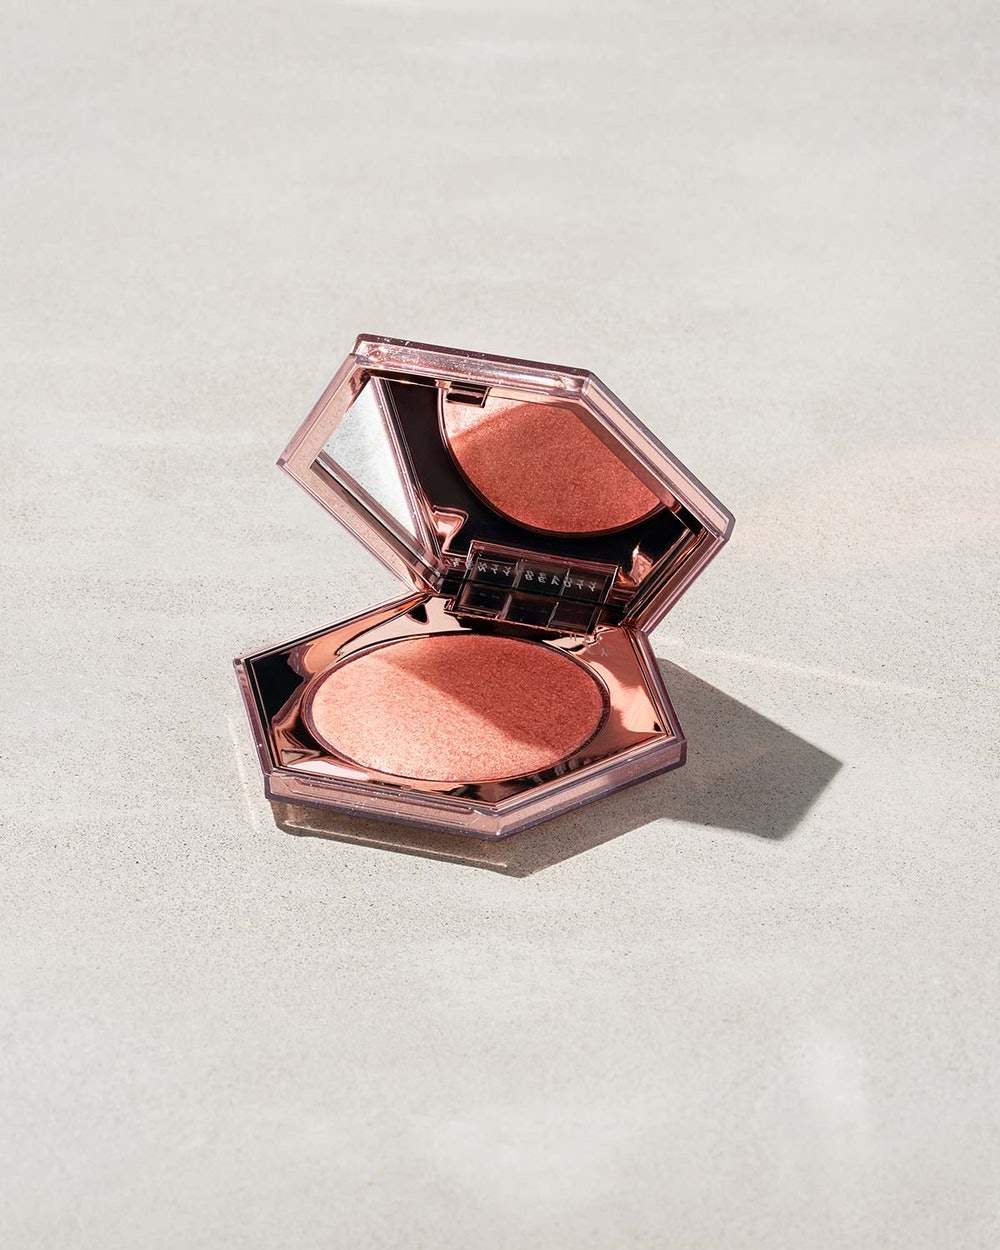 Diamond Bomb in Rosé Rave